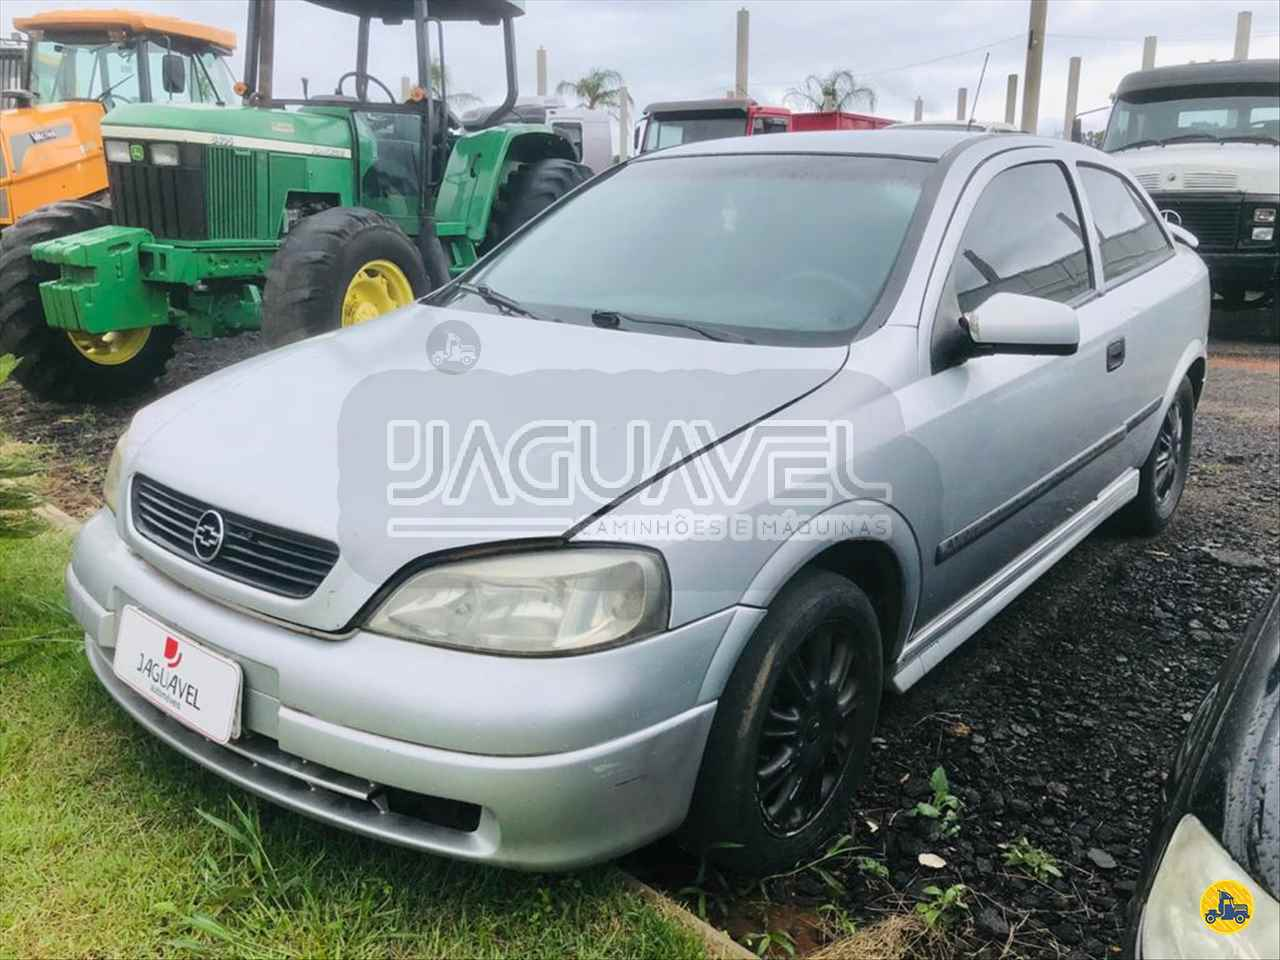 CARRO GM - Chevrolet Astra 2.0 GLS Jaguavel Caminhões JAGUARIAIVA PARANÁ PR